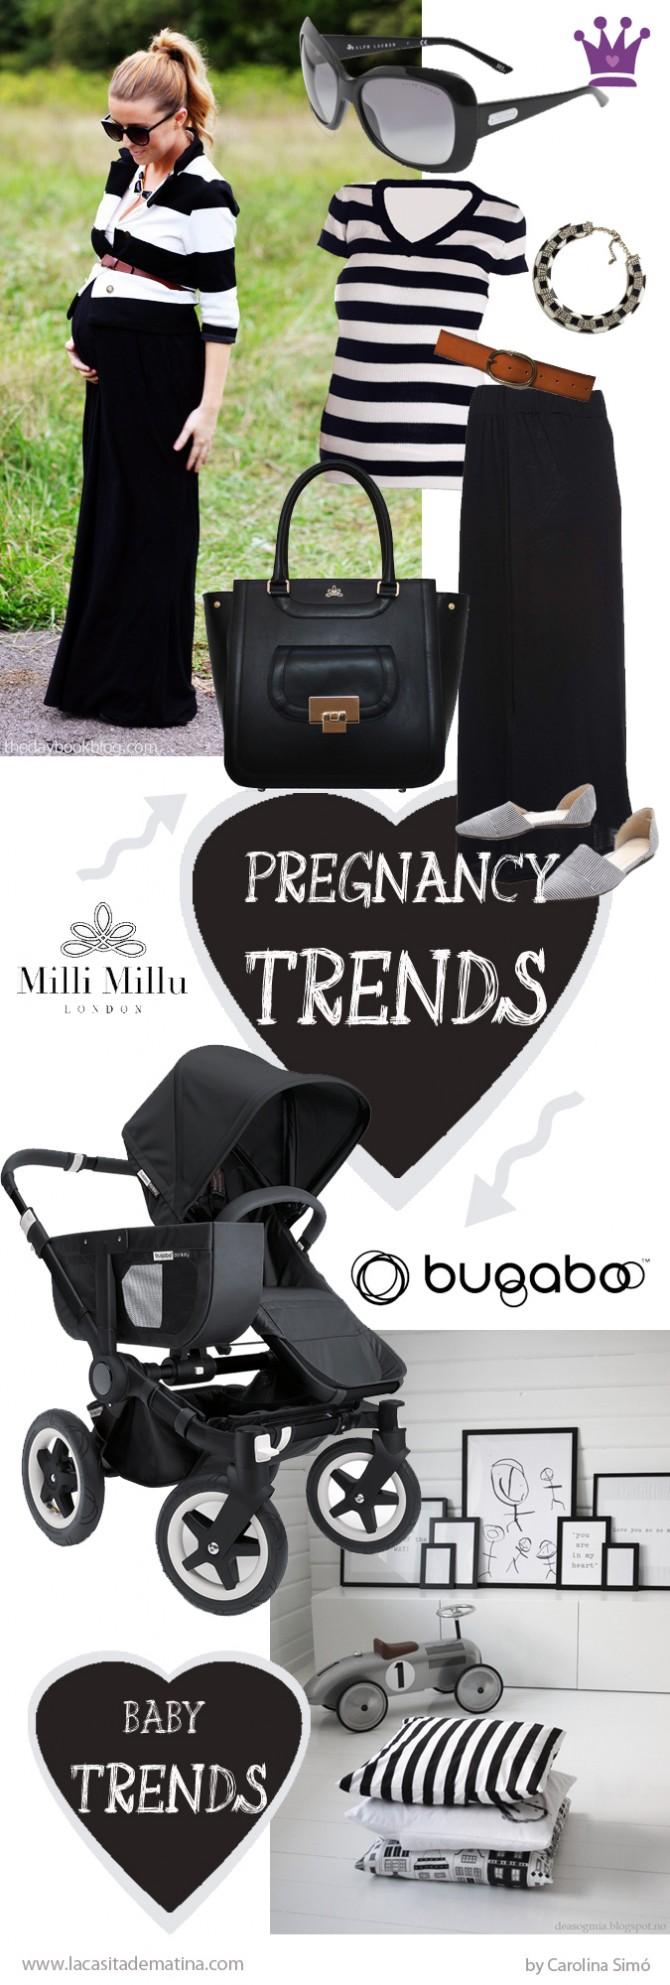 Moda Premamá,  Ropa embarazo, La casita de Martina, Blog de Moda Infantil, Carolina Simó